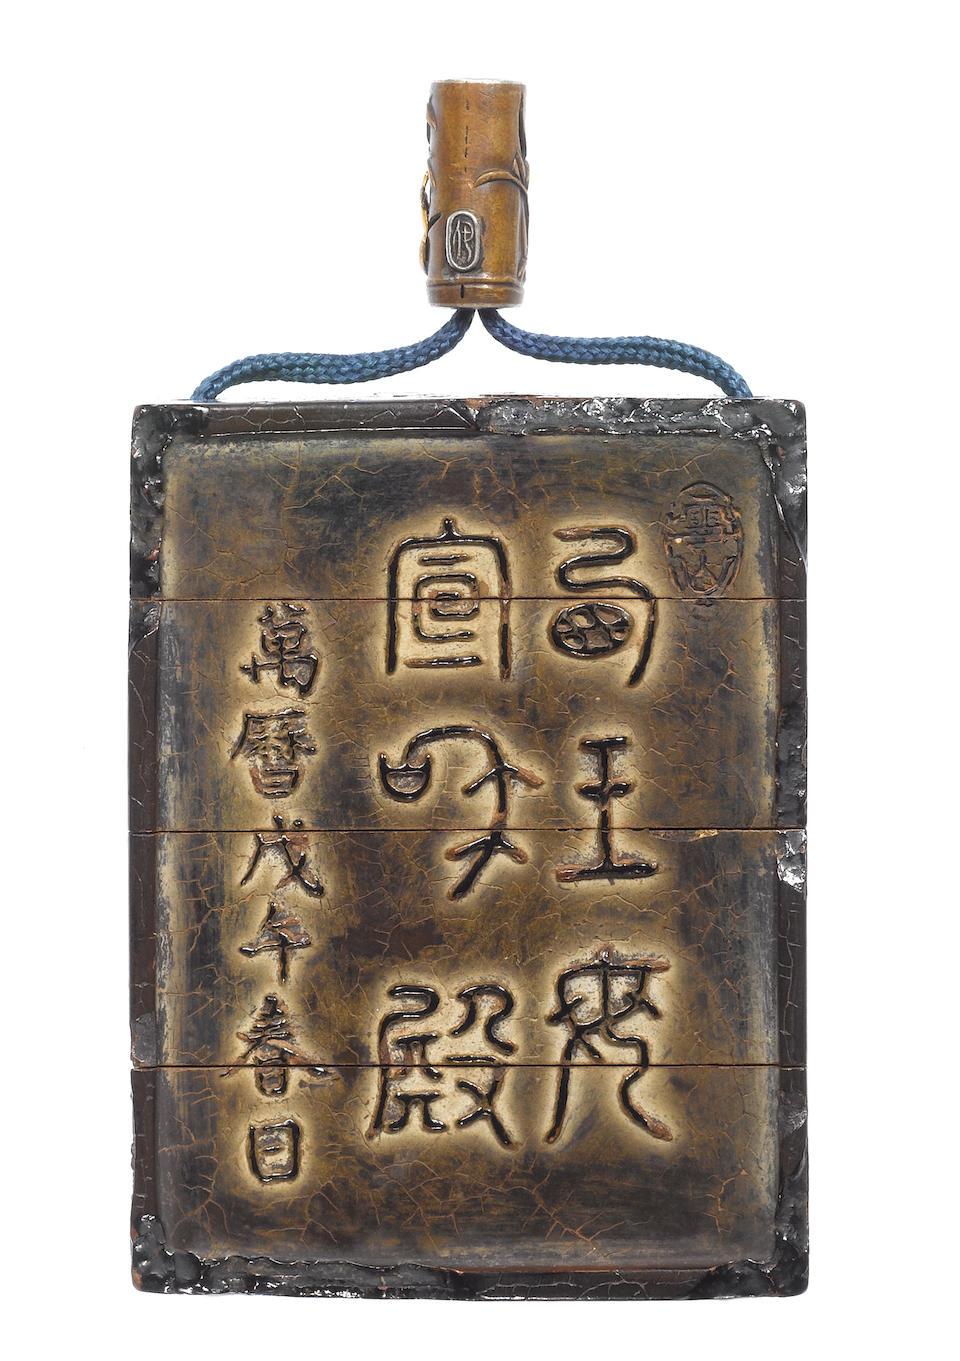 A lacquer three-case inro By Kimura Jukkyoku, 18th century